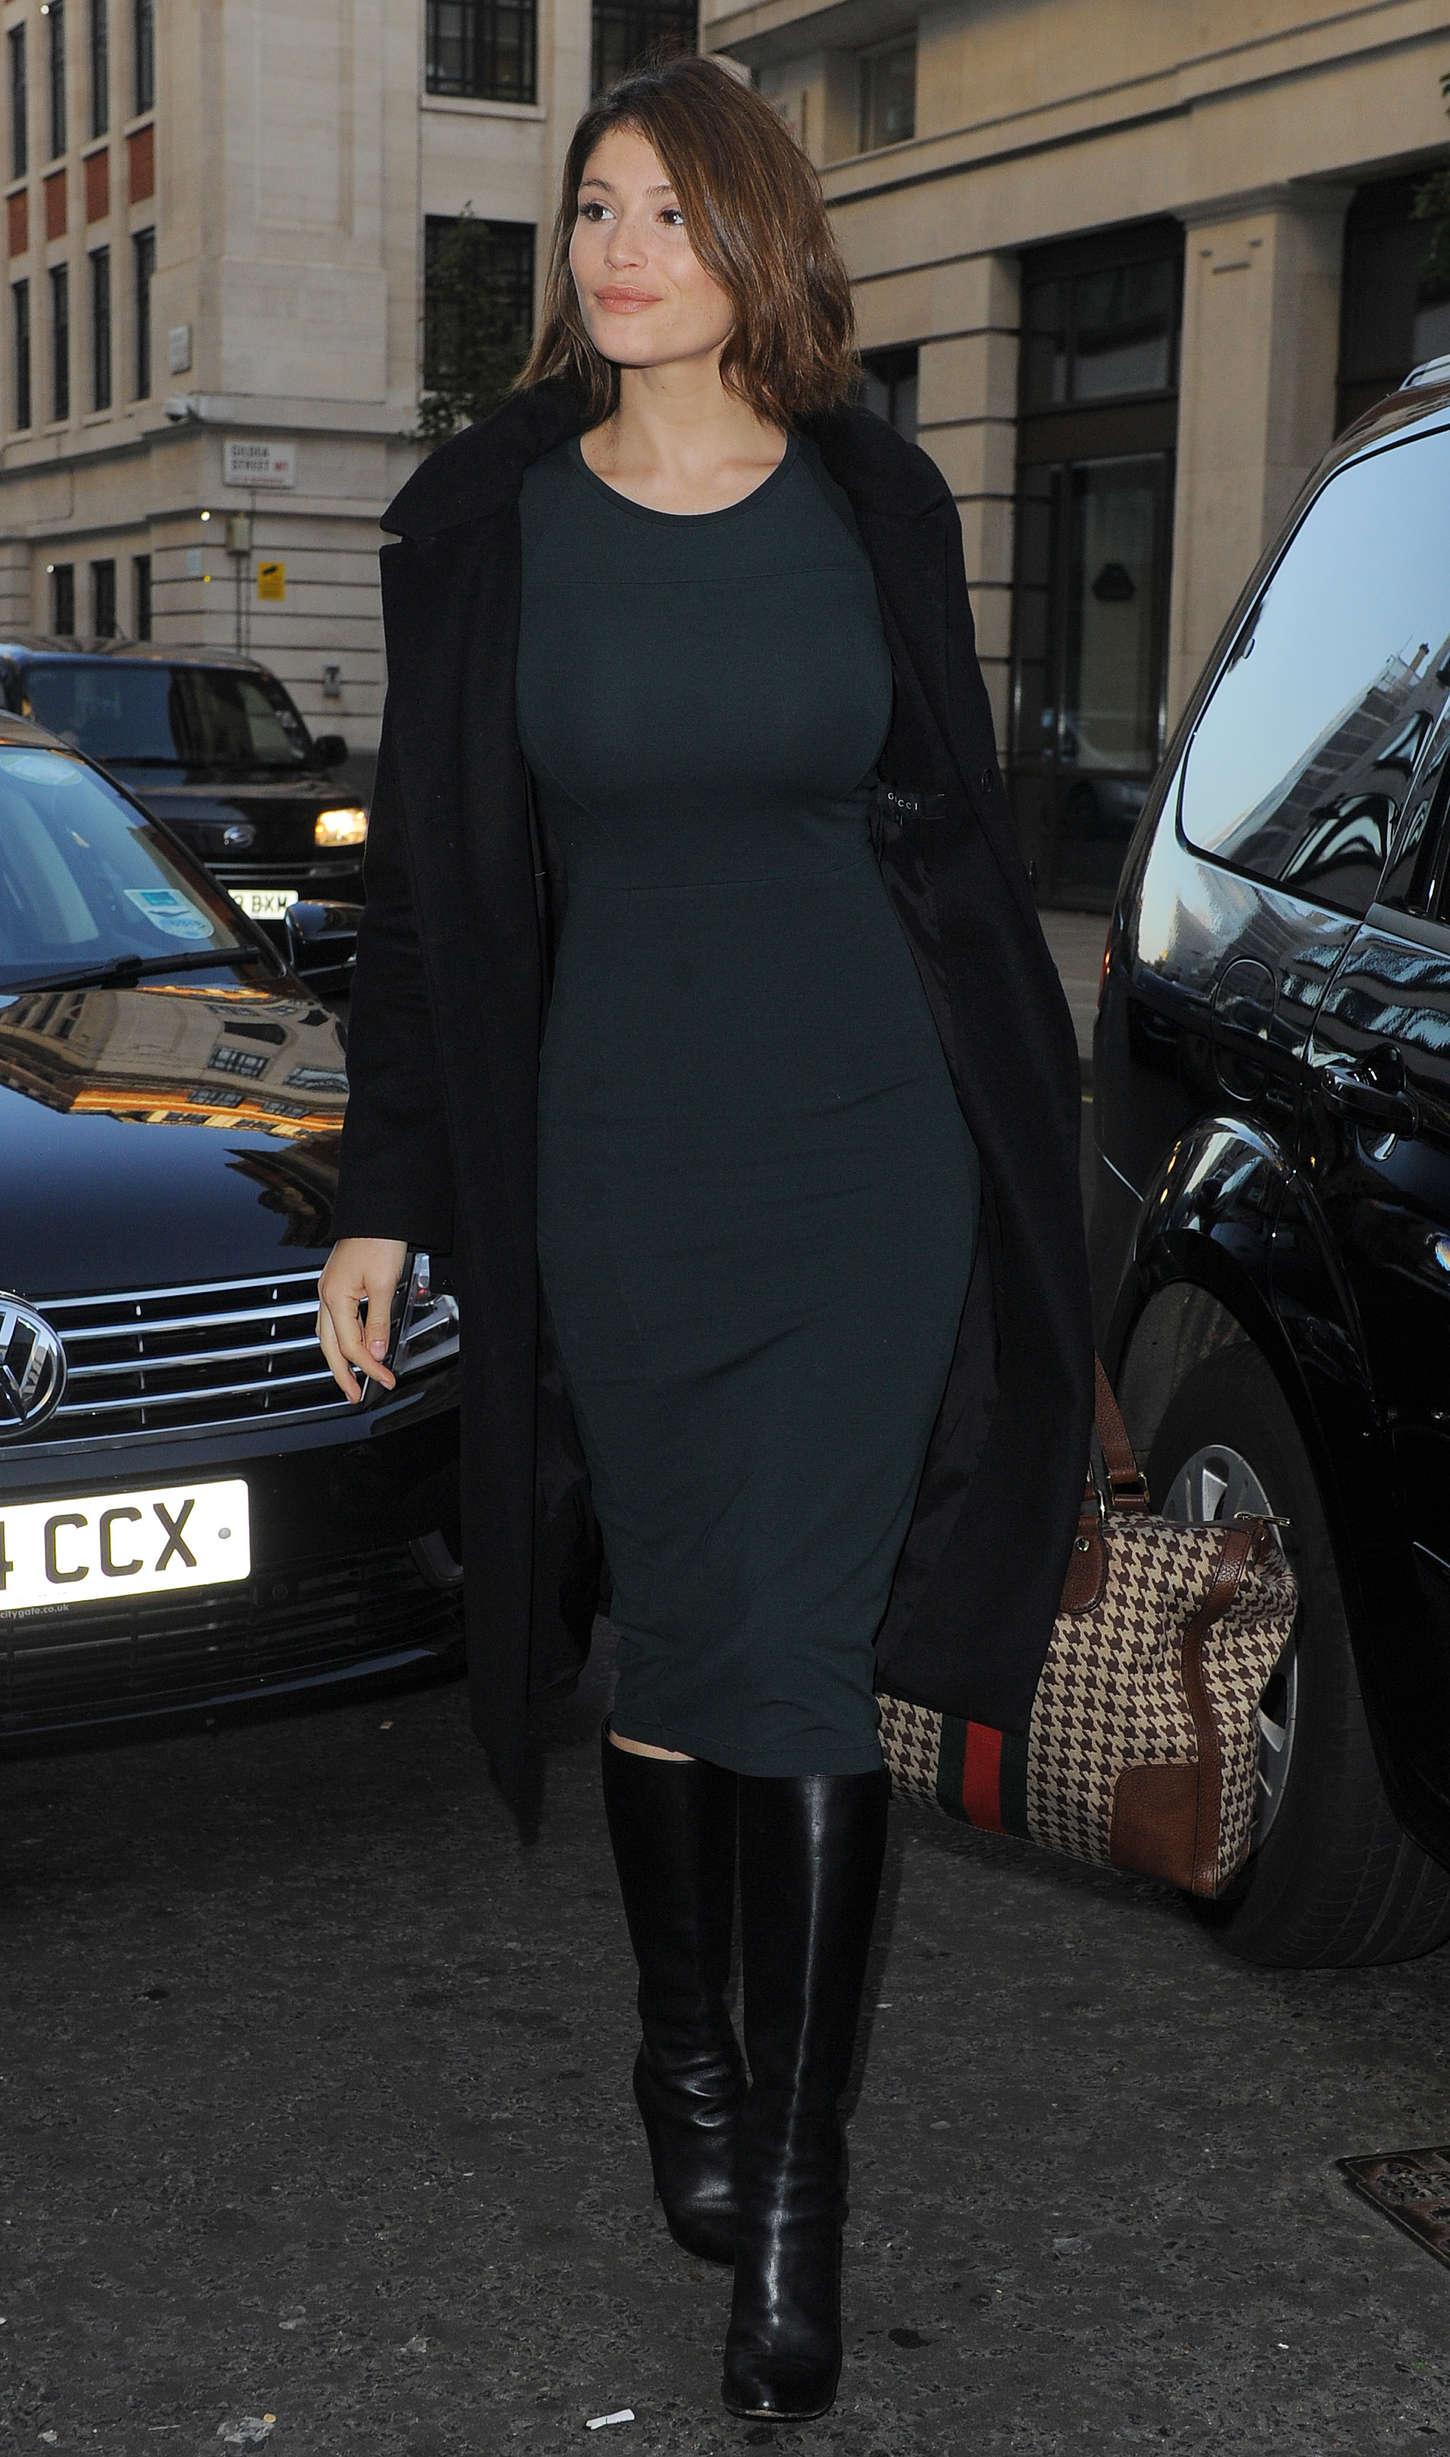 Gemma Arterton in Green Tight Dress -12 - GotCeleb